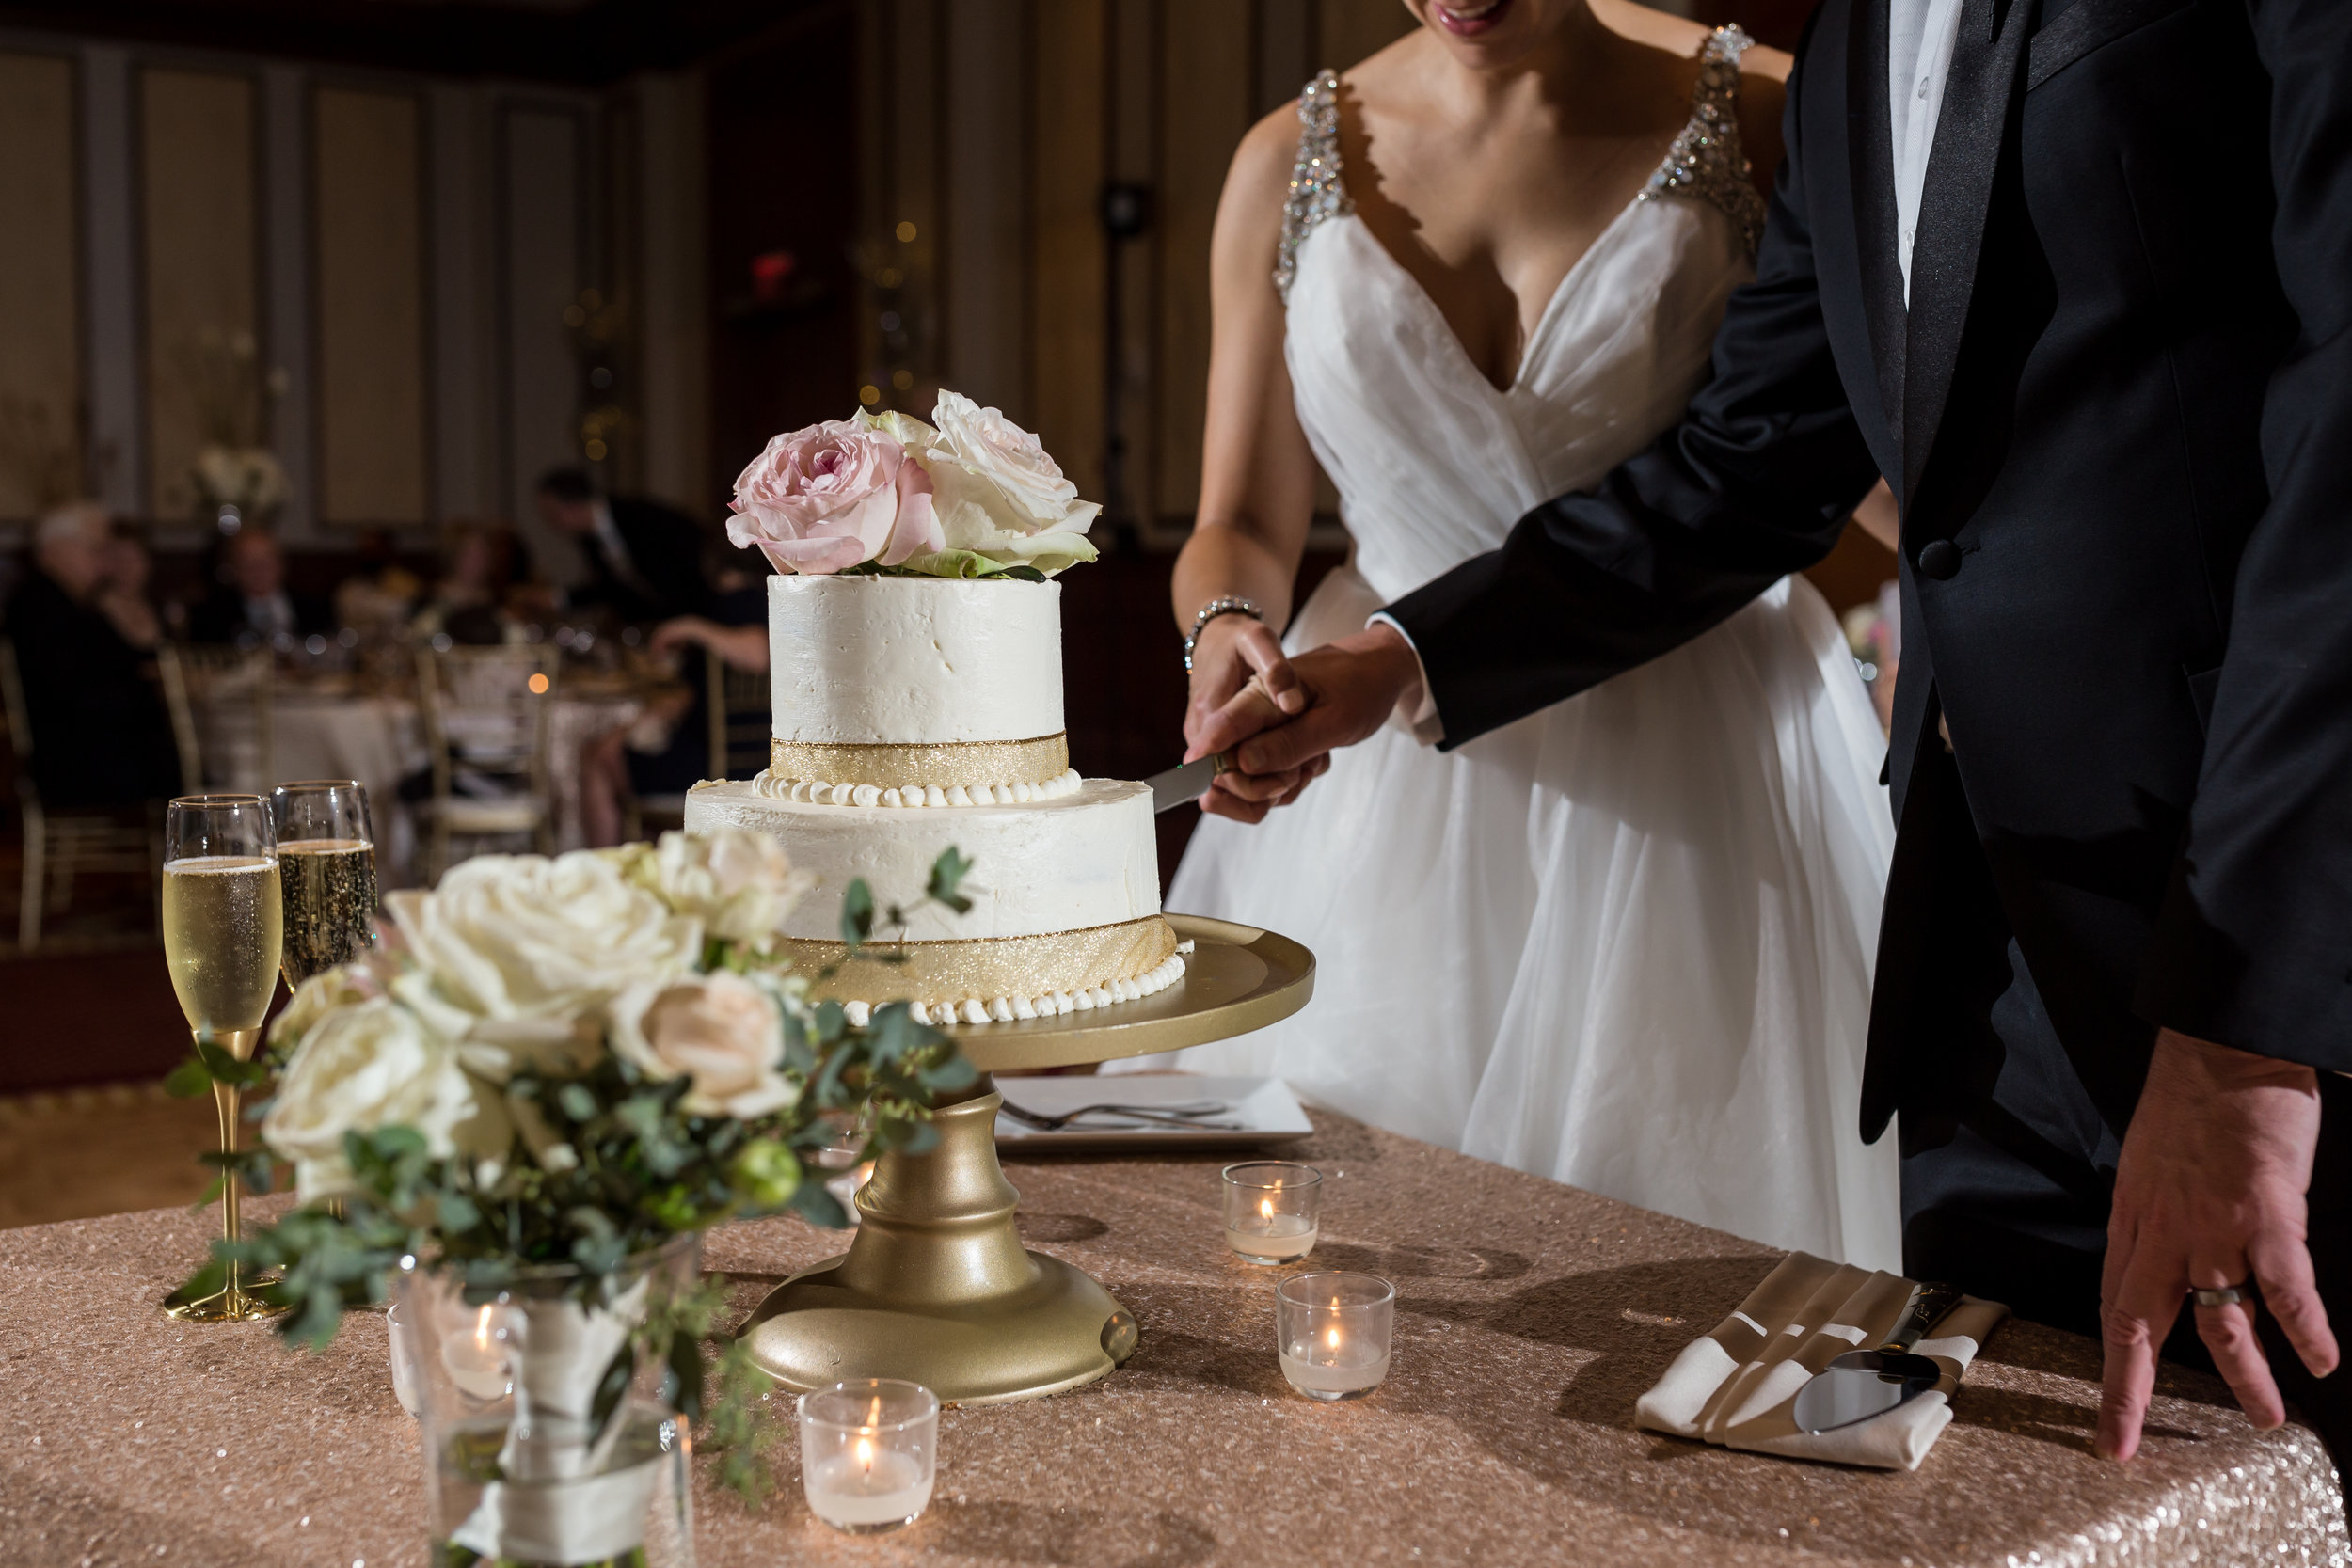 DaussFOTO Wedding Photography_20180908_0736.jpg